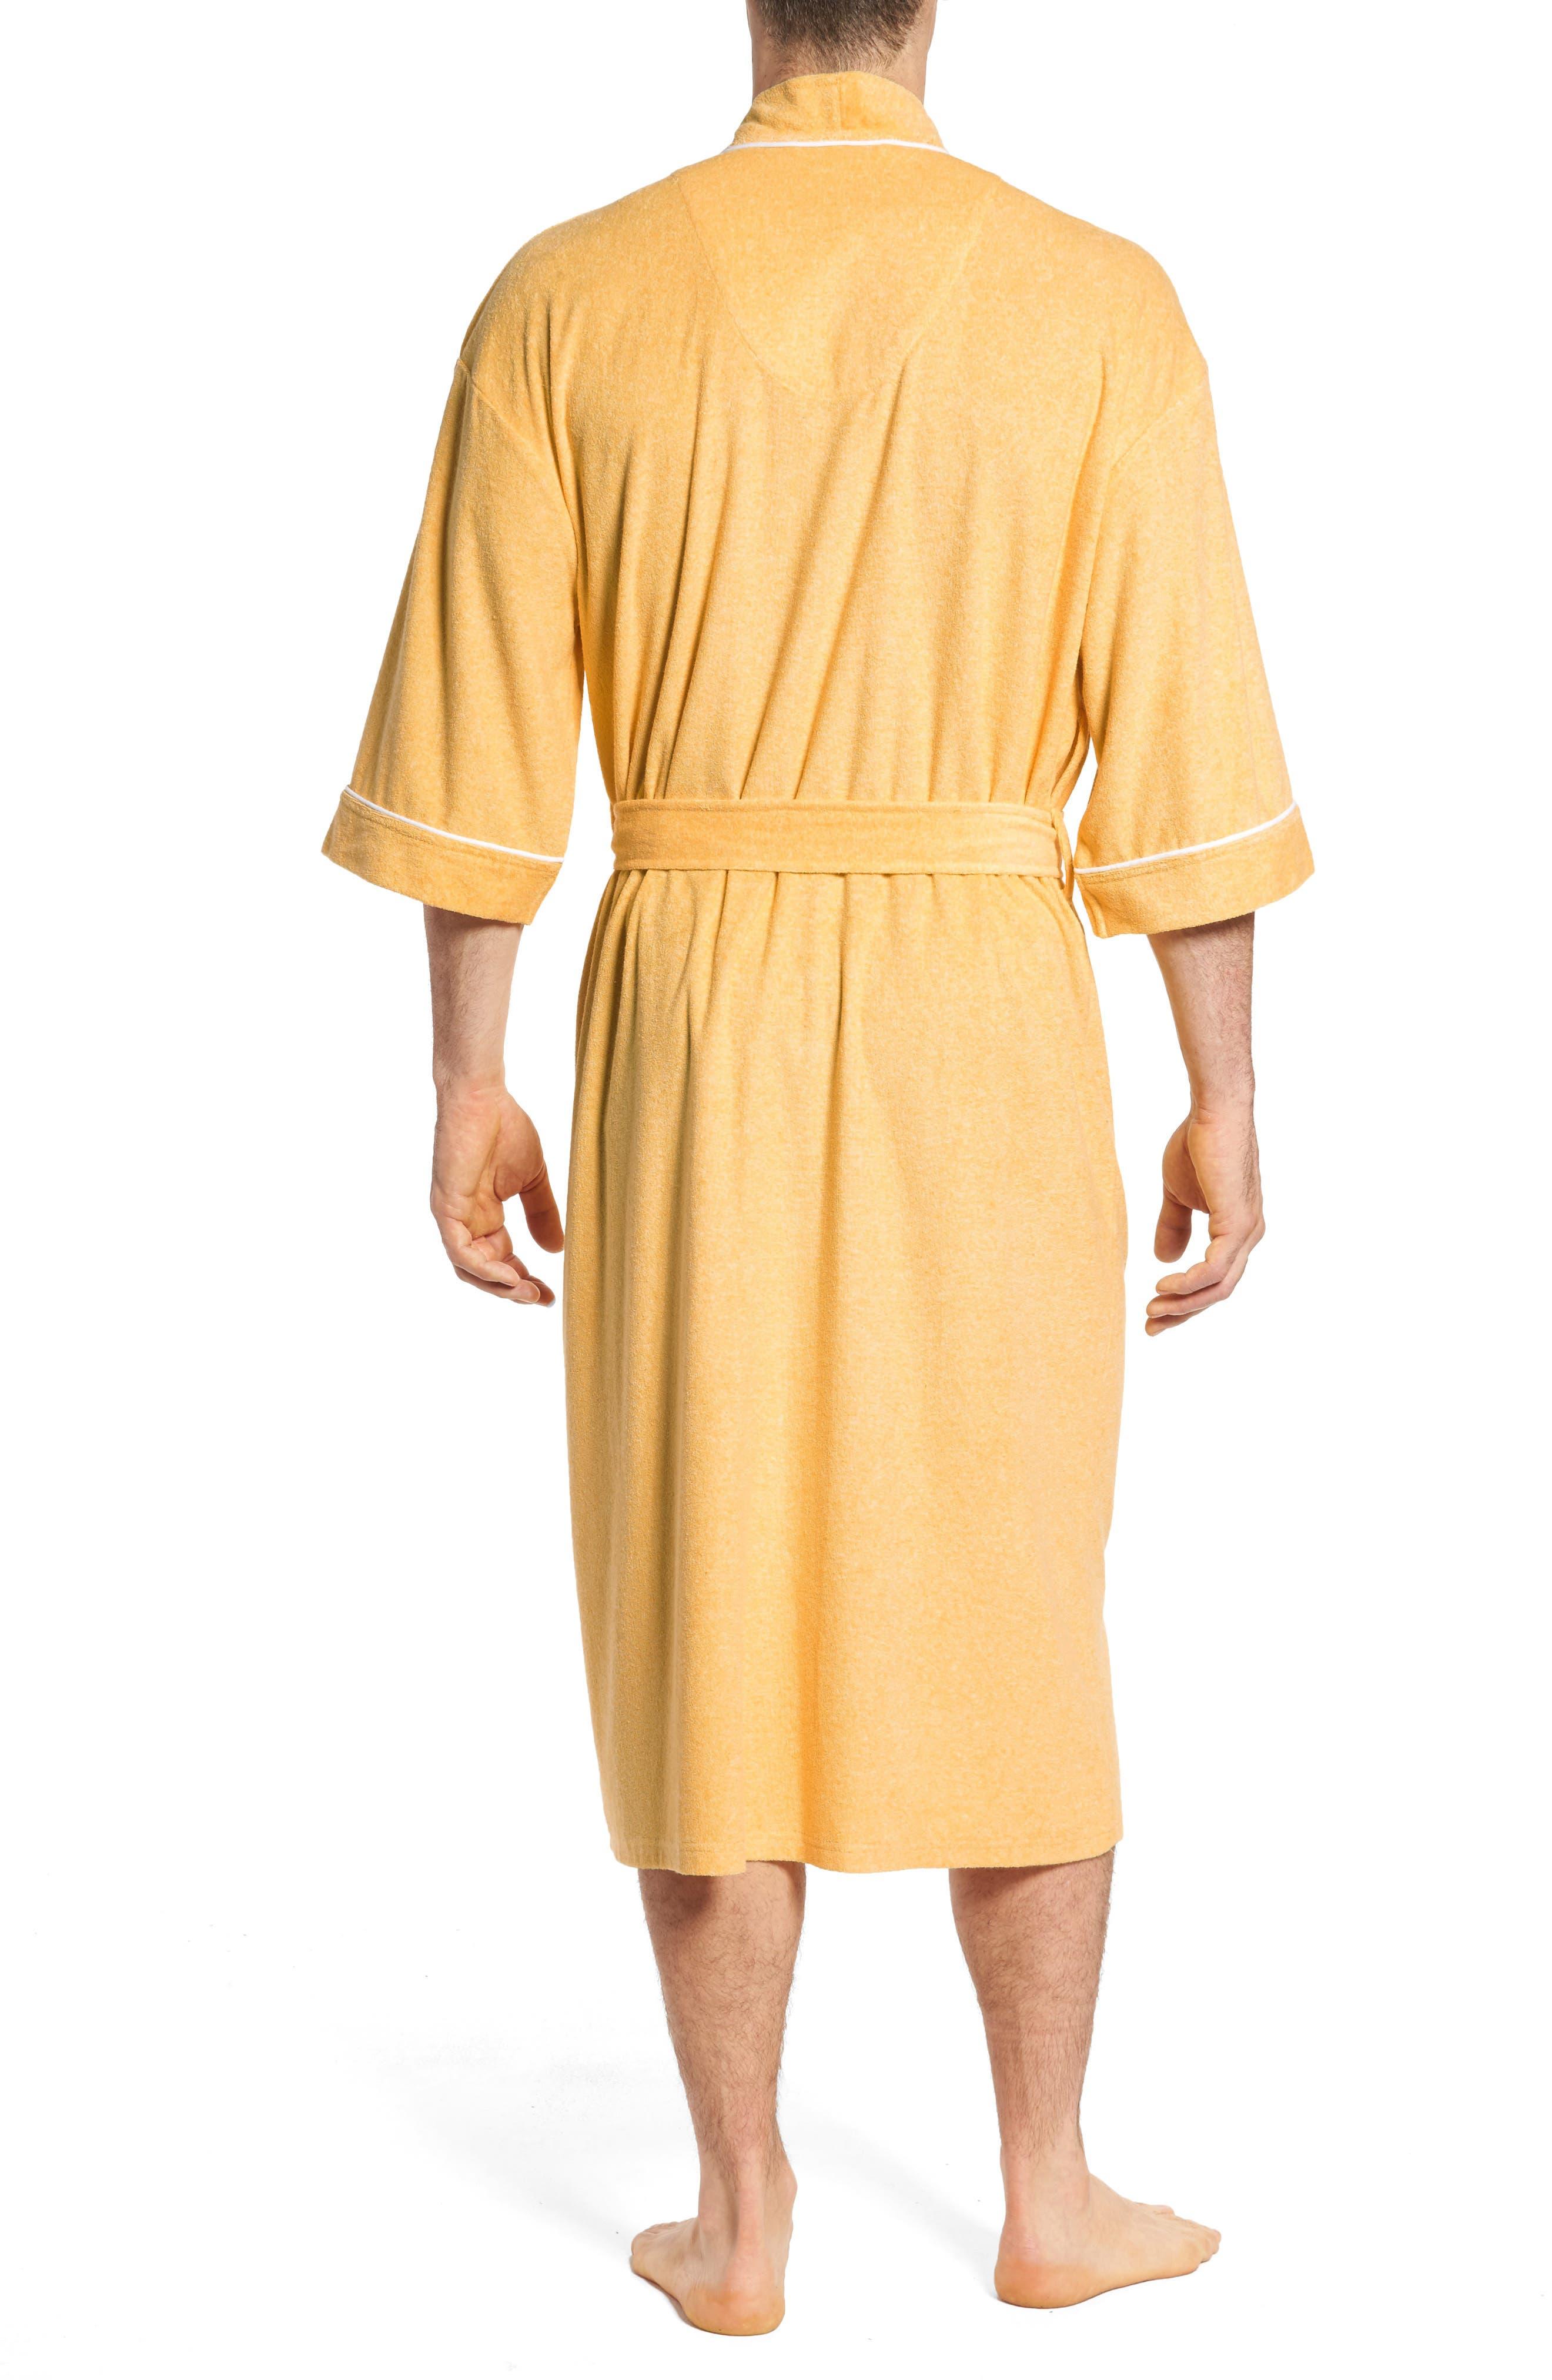 Kimono Cotton Blend Robe,                             Alternate thumbnail 2, color,                             700